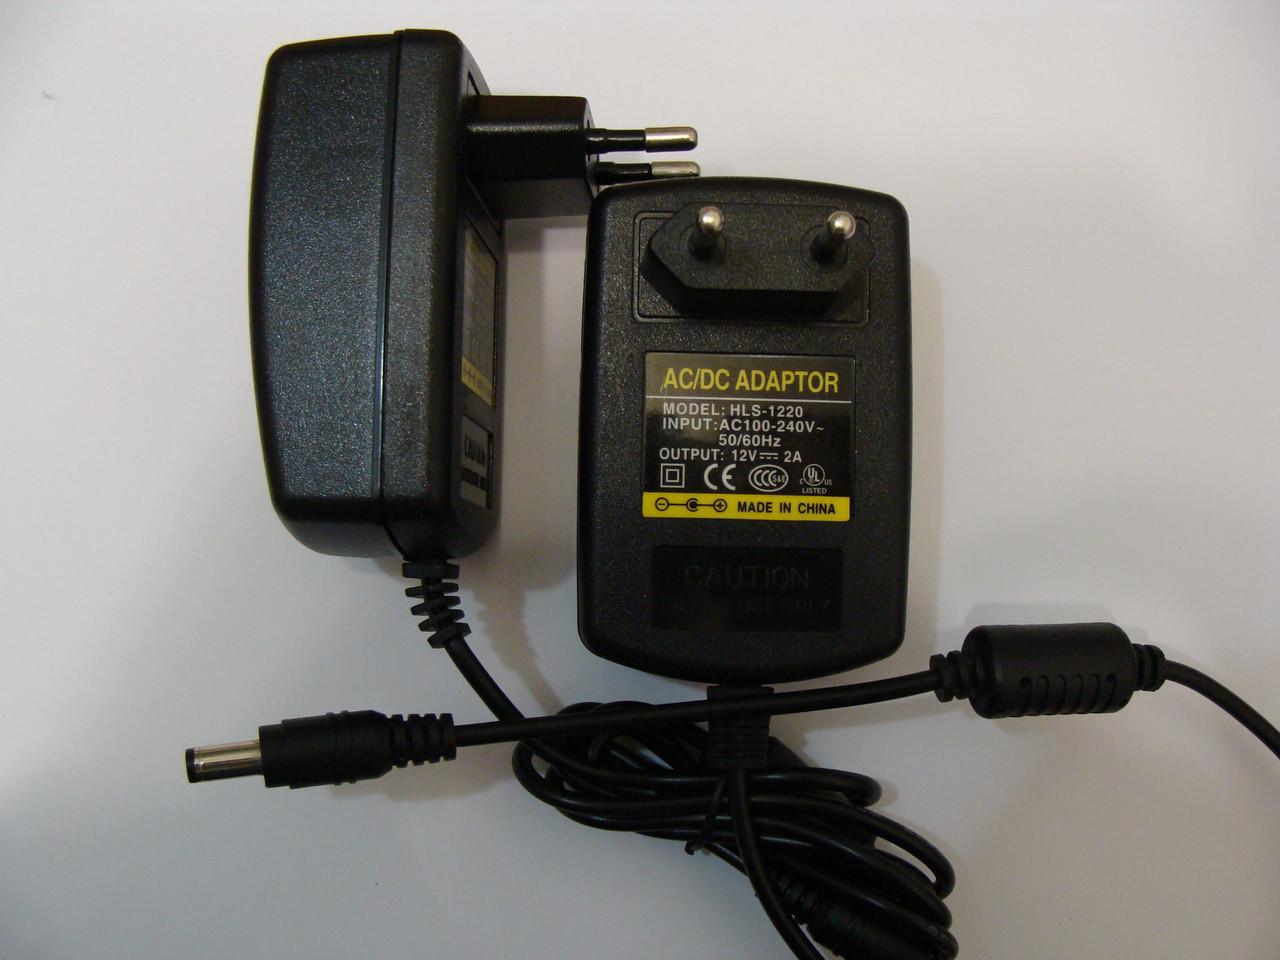 12V 2A зарядка адаптер Блок живлення штекер 5,5х2,5 мм для Liitokala lii-500